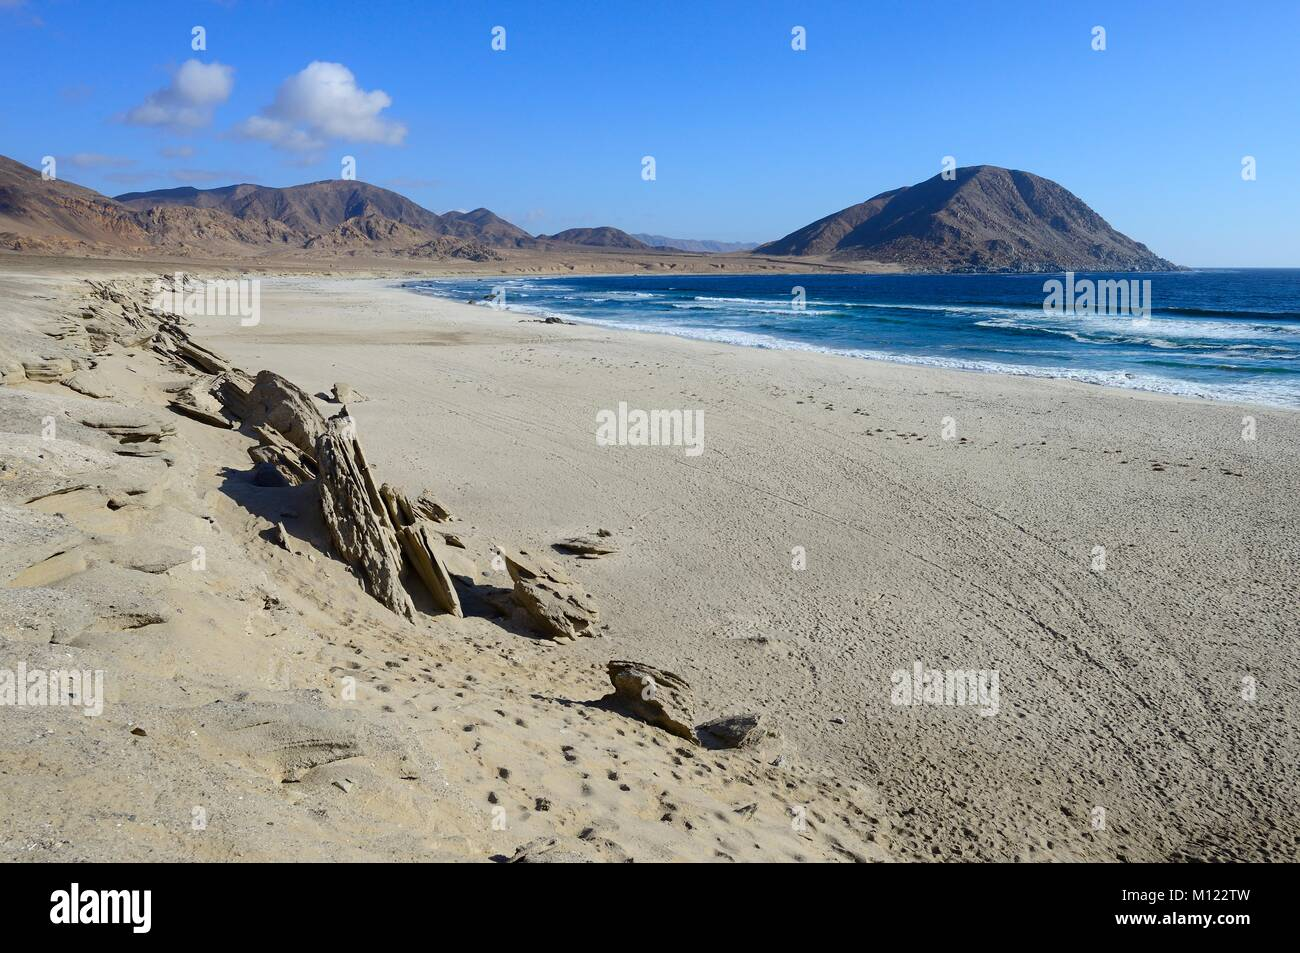 Lonely sandy beach on the Pacific Ocean,Pan de Azúcar National Park,near Chañaral,Región de Atacama,Chile - Stock Image